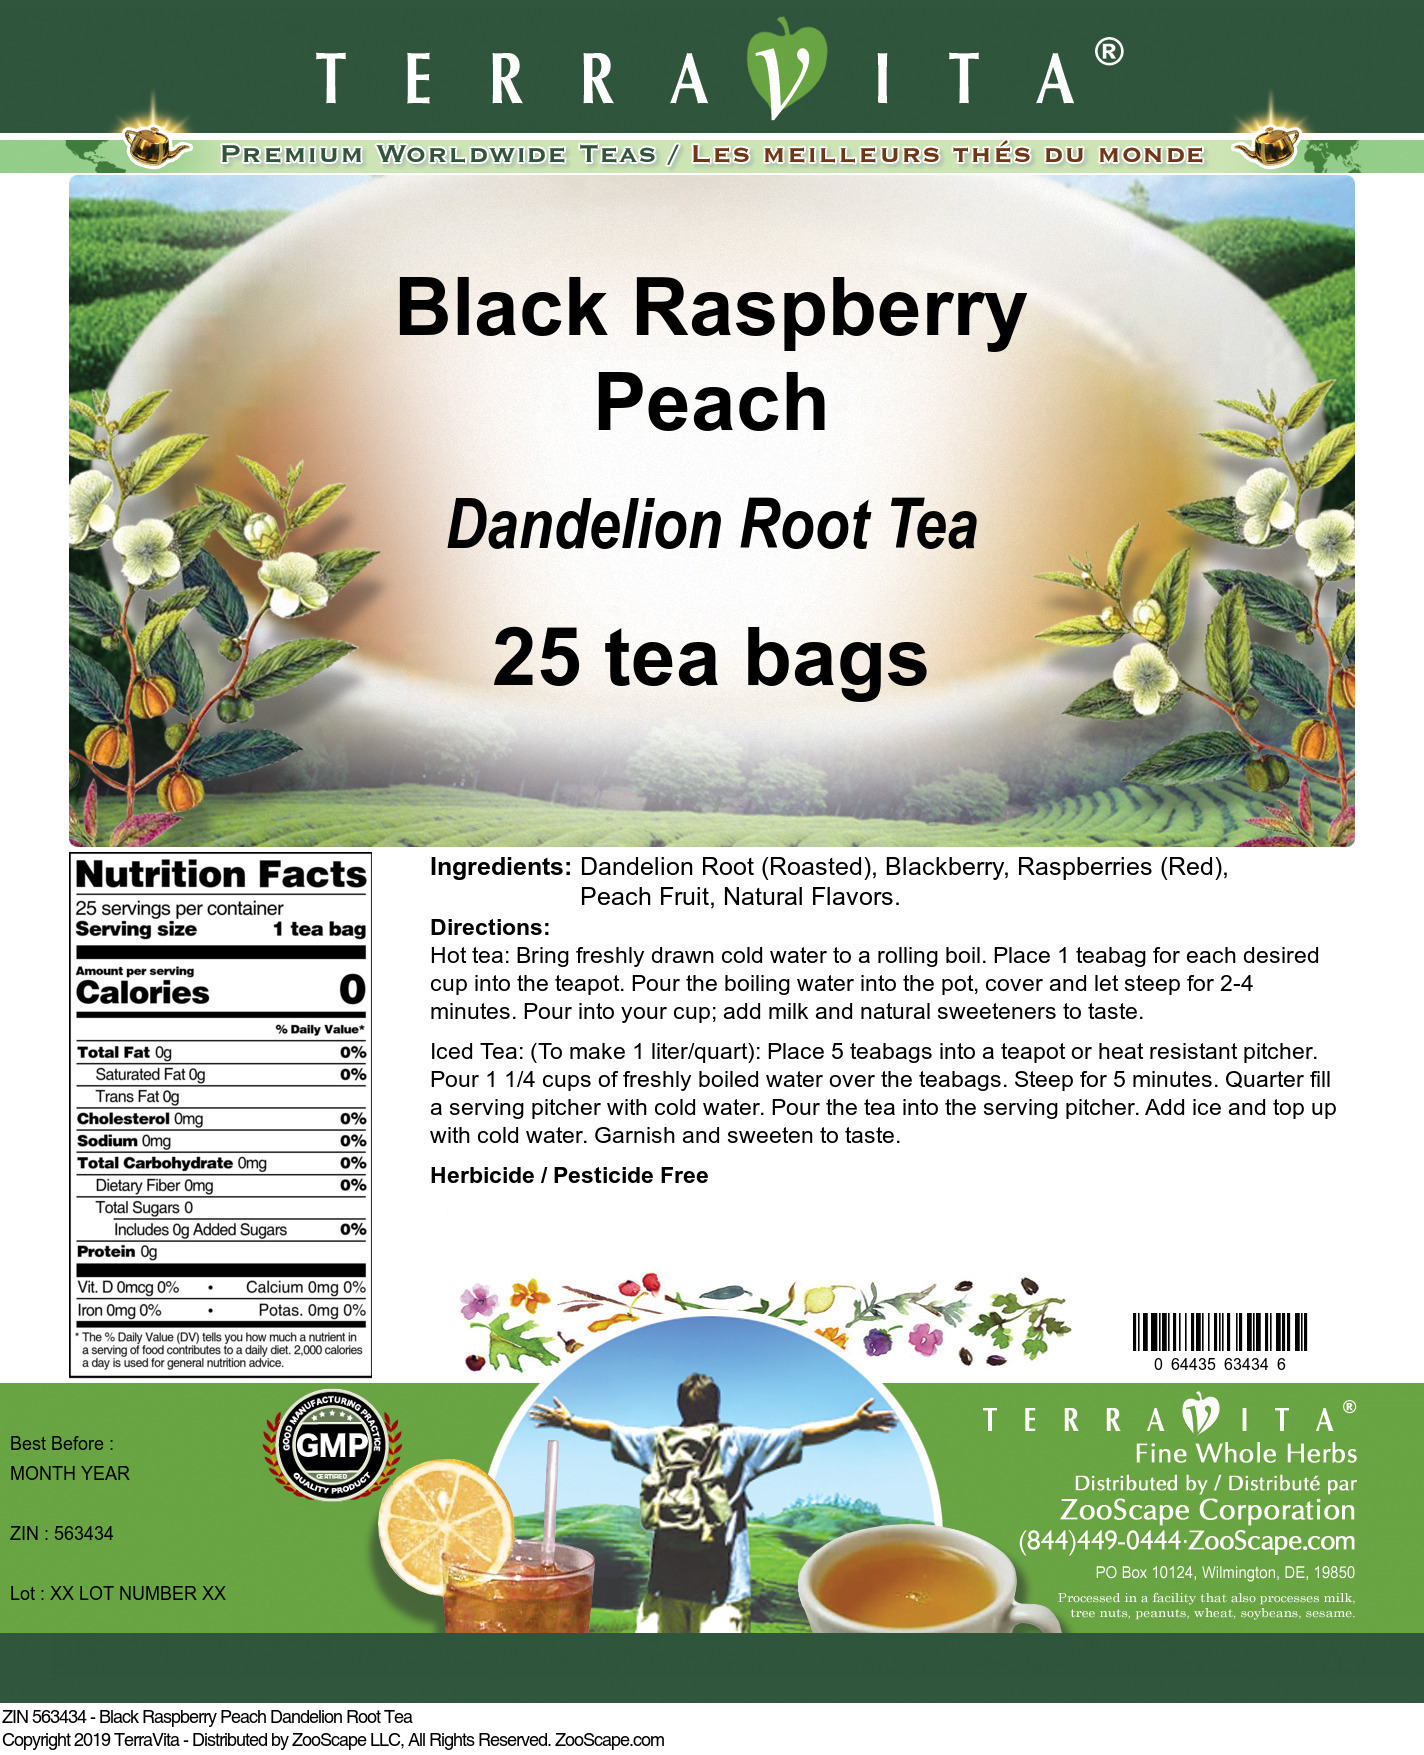 Black Raspberry Peach Dandelion Root